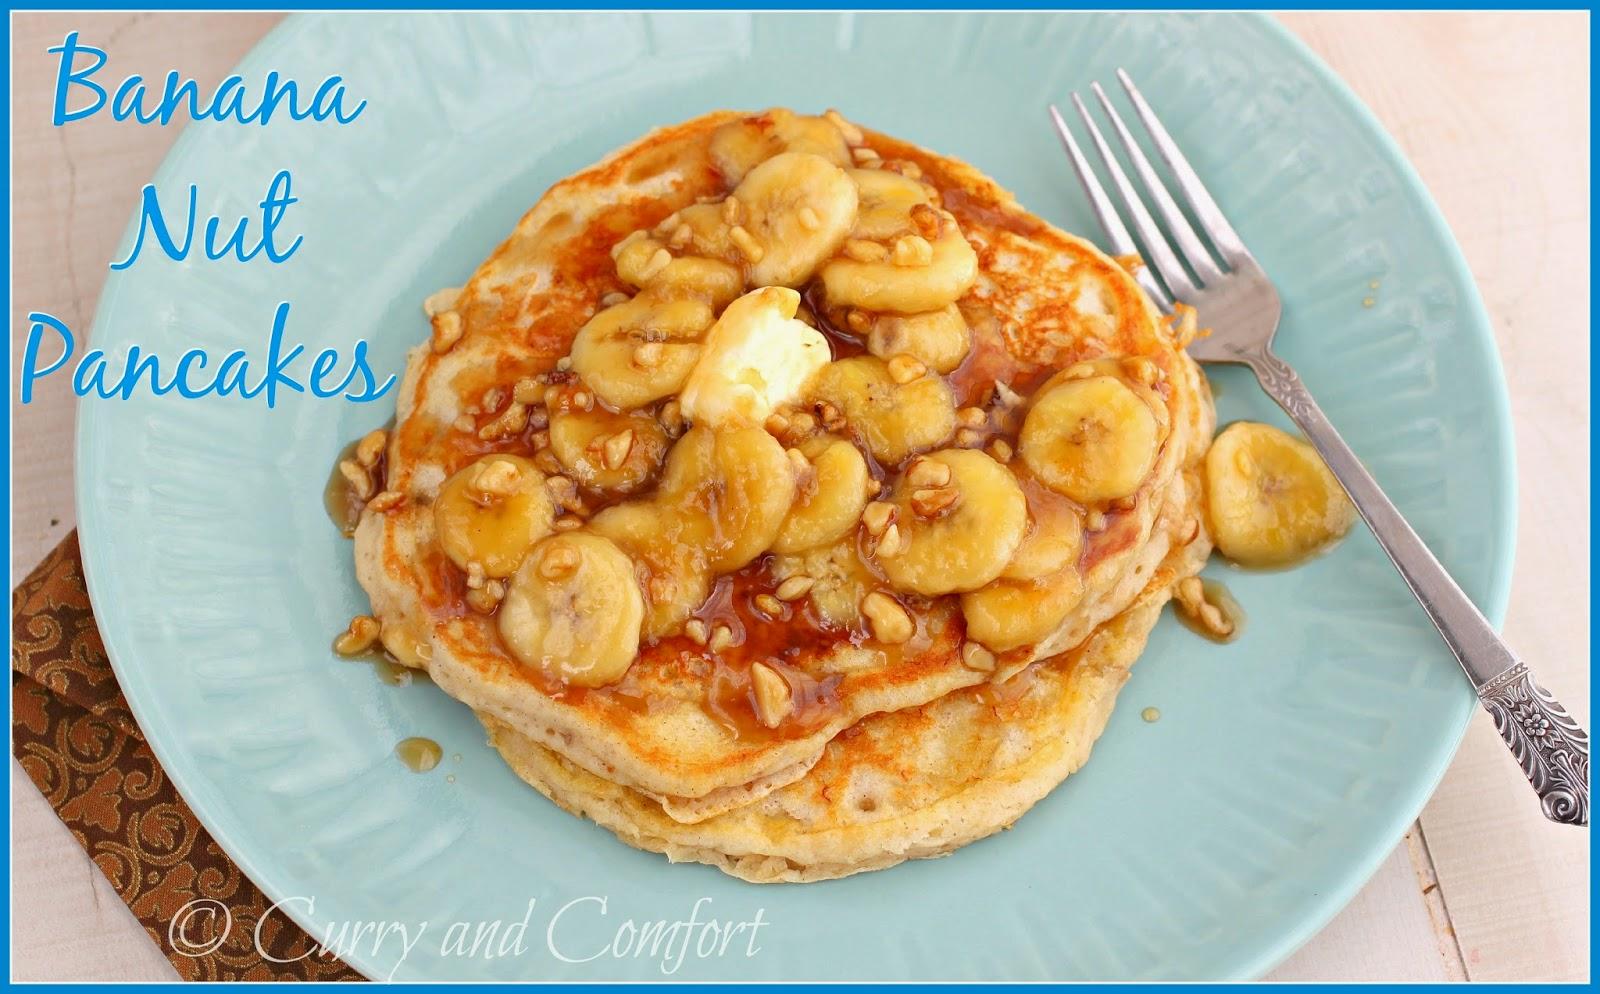 Kitchen Simmer: Banana Nut Pancakes